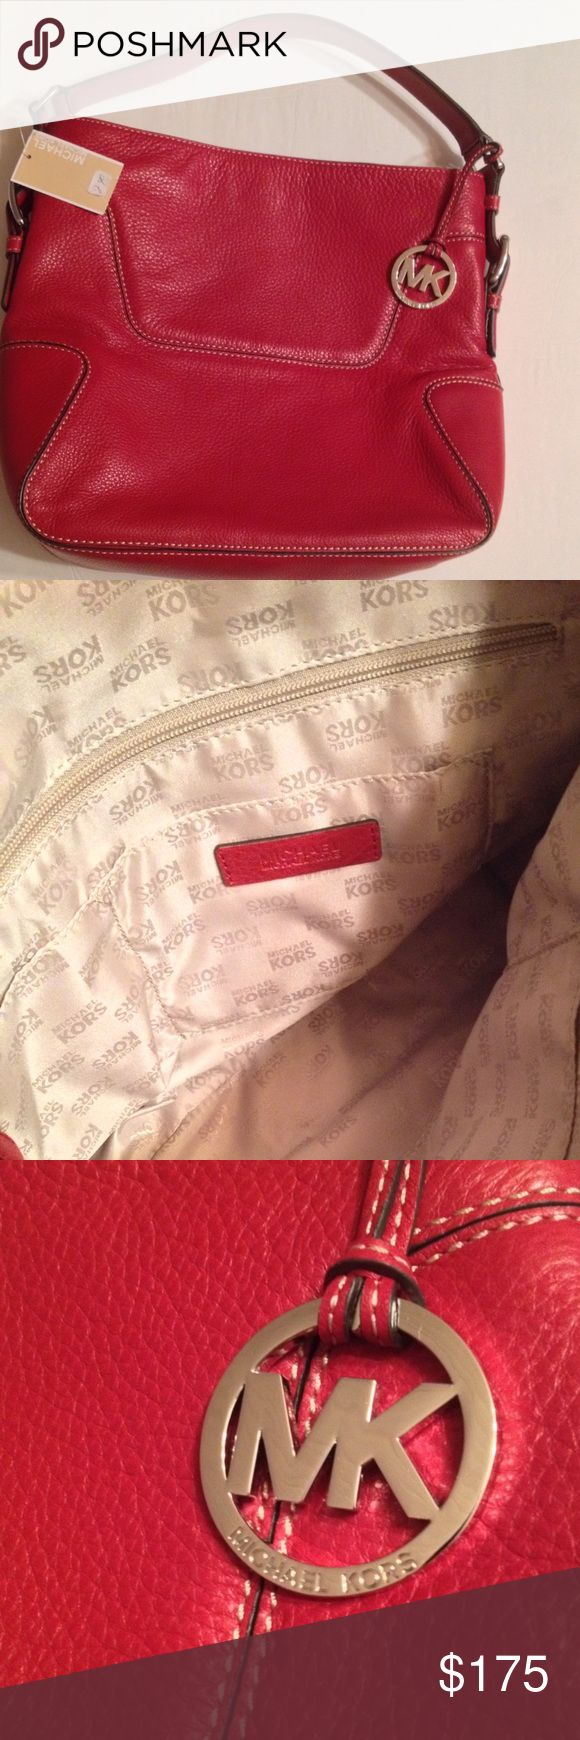 NWT Michael Kors Large Red Shoulder Bag *Would consider trade for pink, purple/Lavender or blue COACH. Authentic NWT Michael Kors Large Red Leather Shoulder Bag. Michael Kors Bags Shoulder Bags